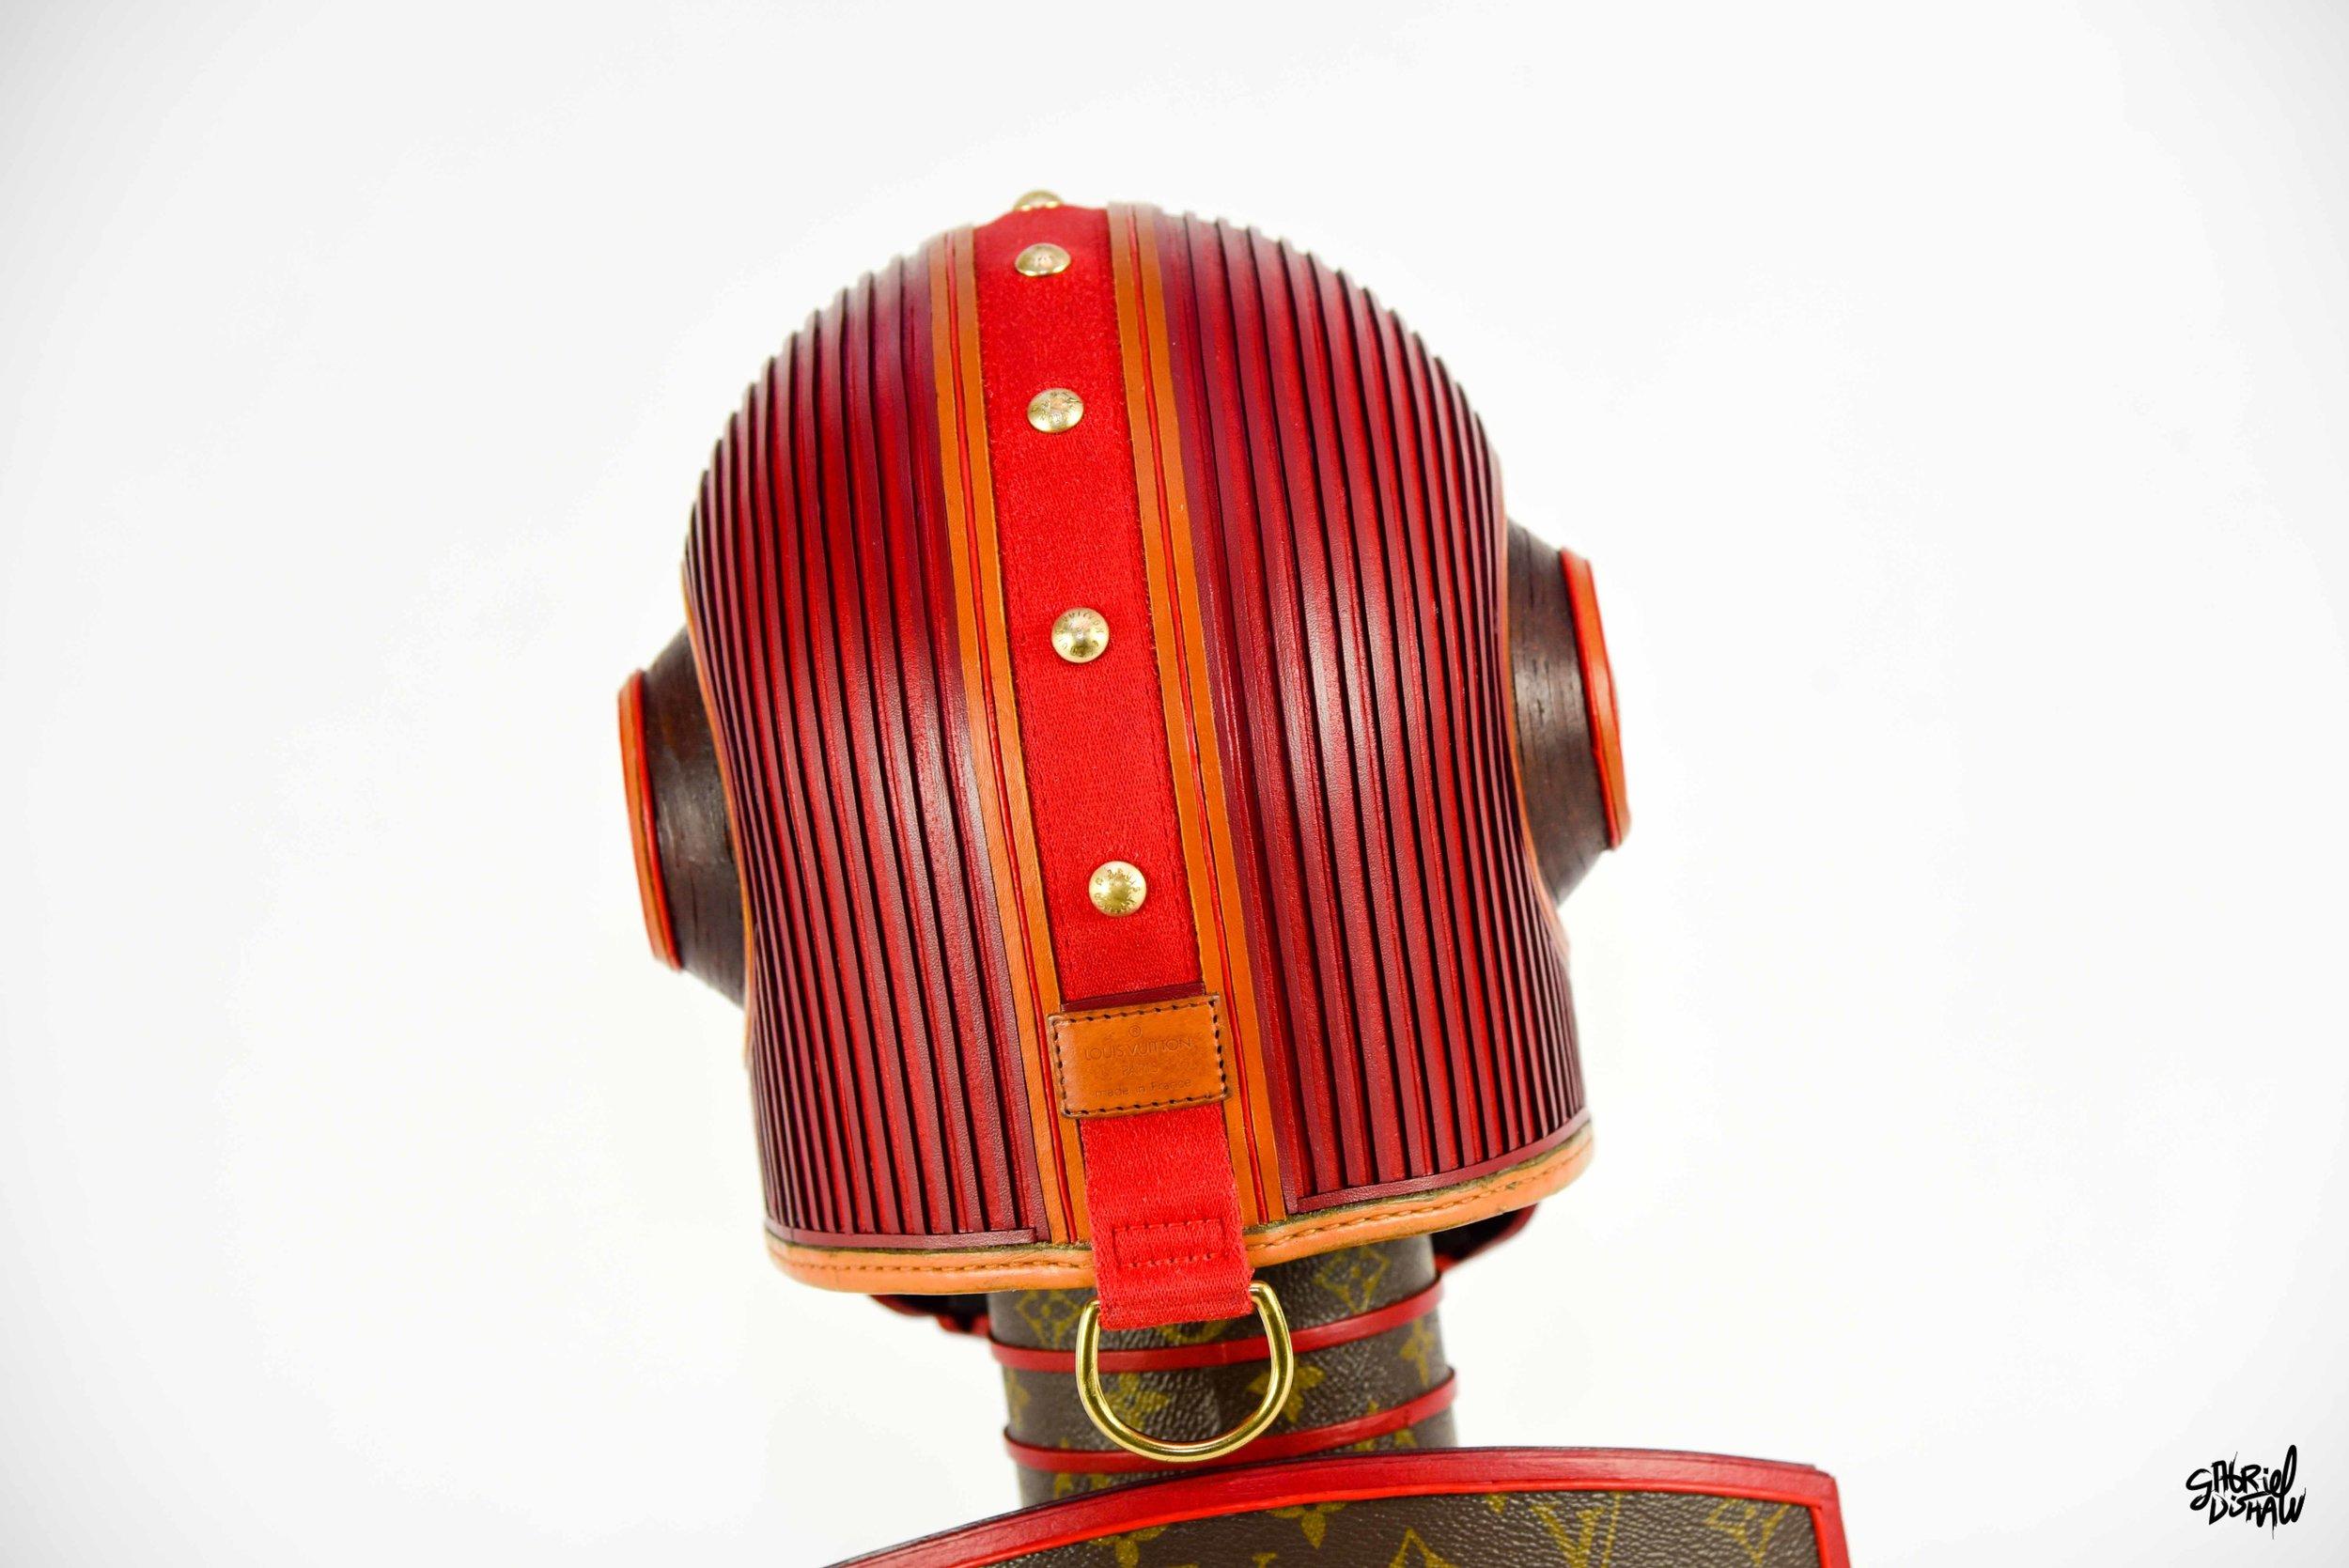 Gabriel Dishaw Vintage Iron Man LV-0111.jpg